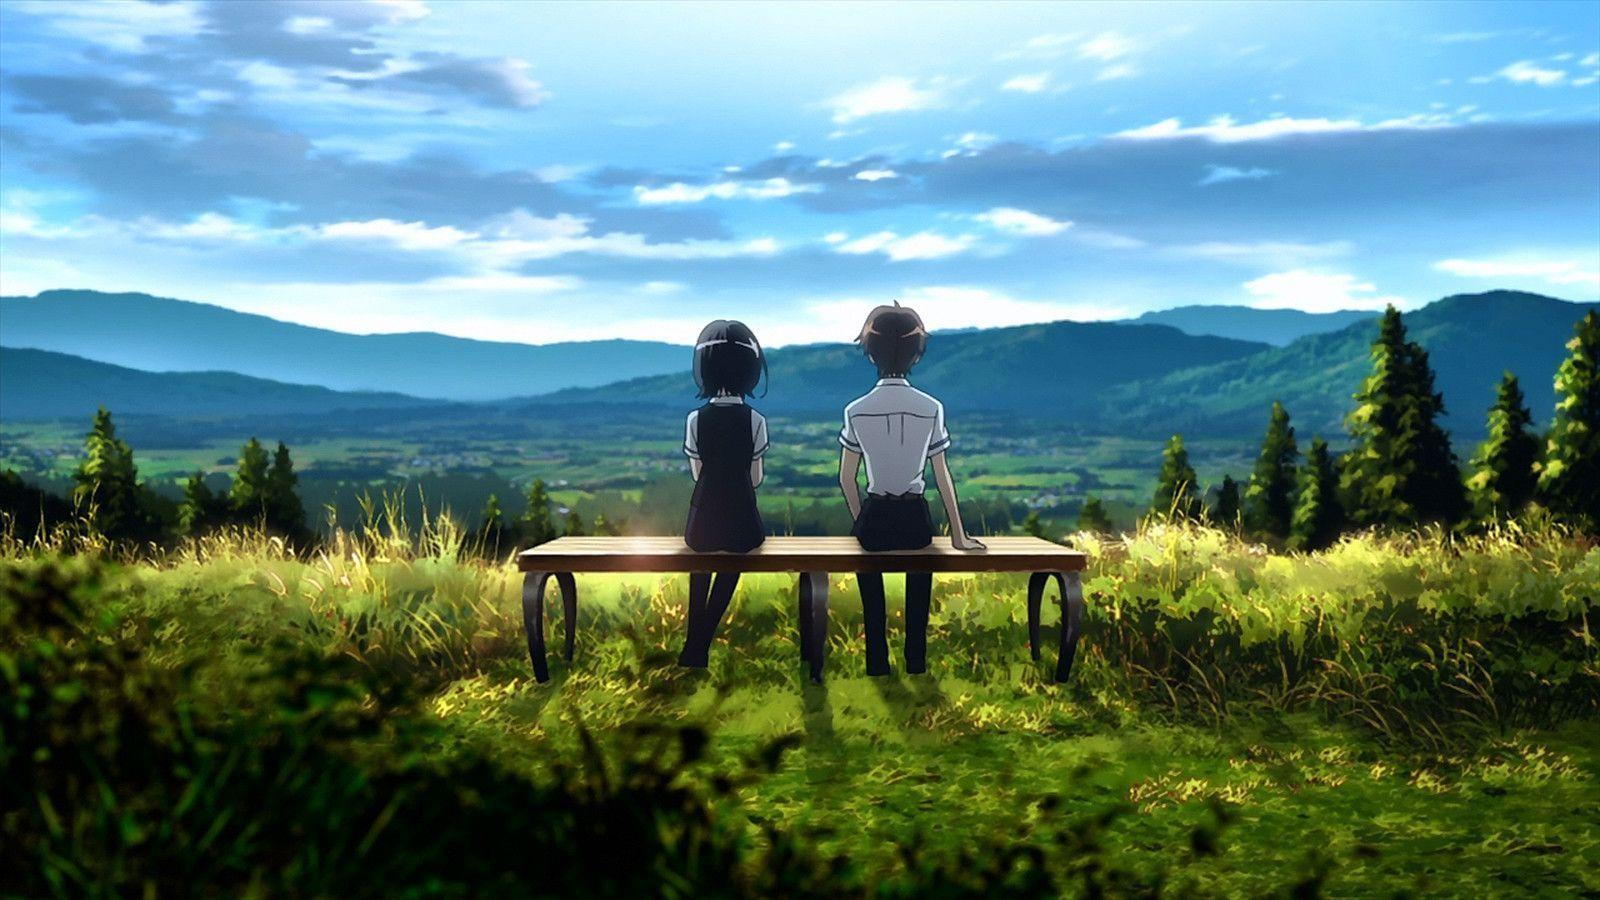 romantic anime wallpaper - photo #36